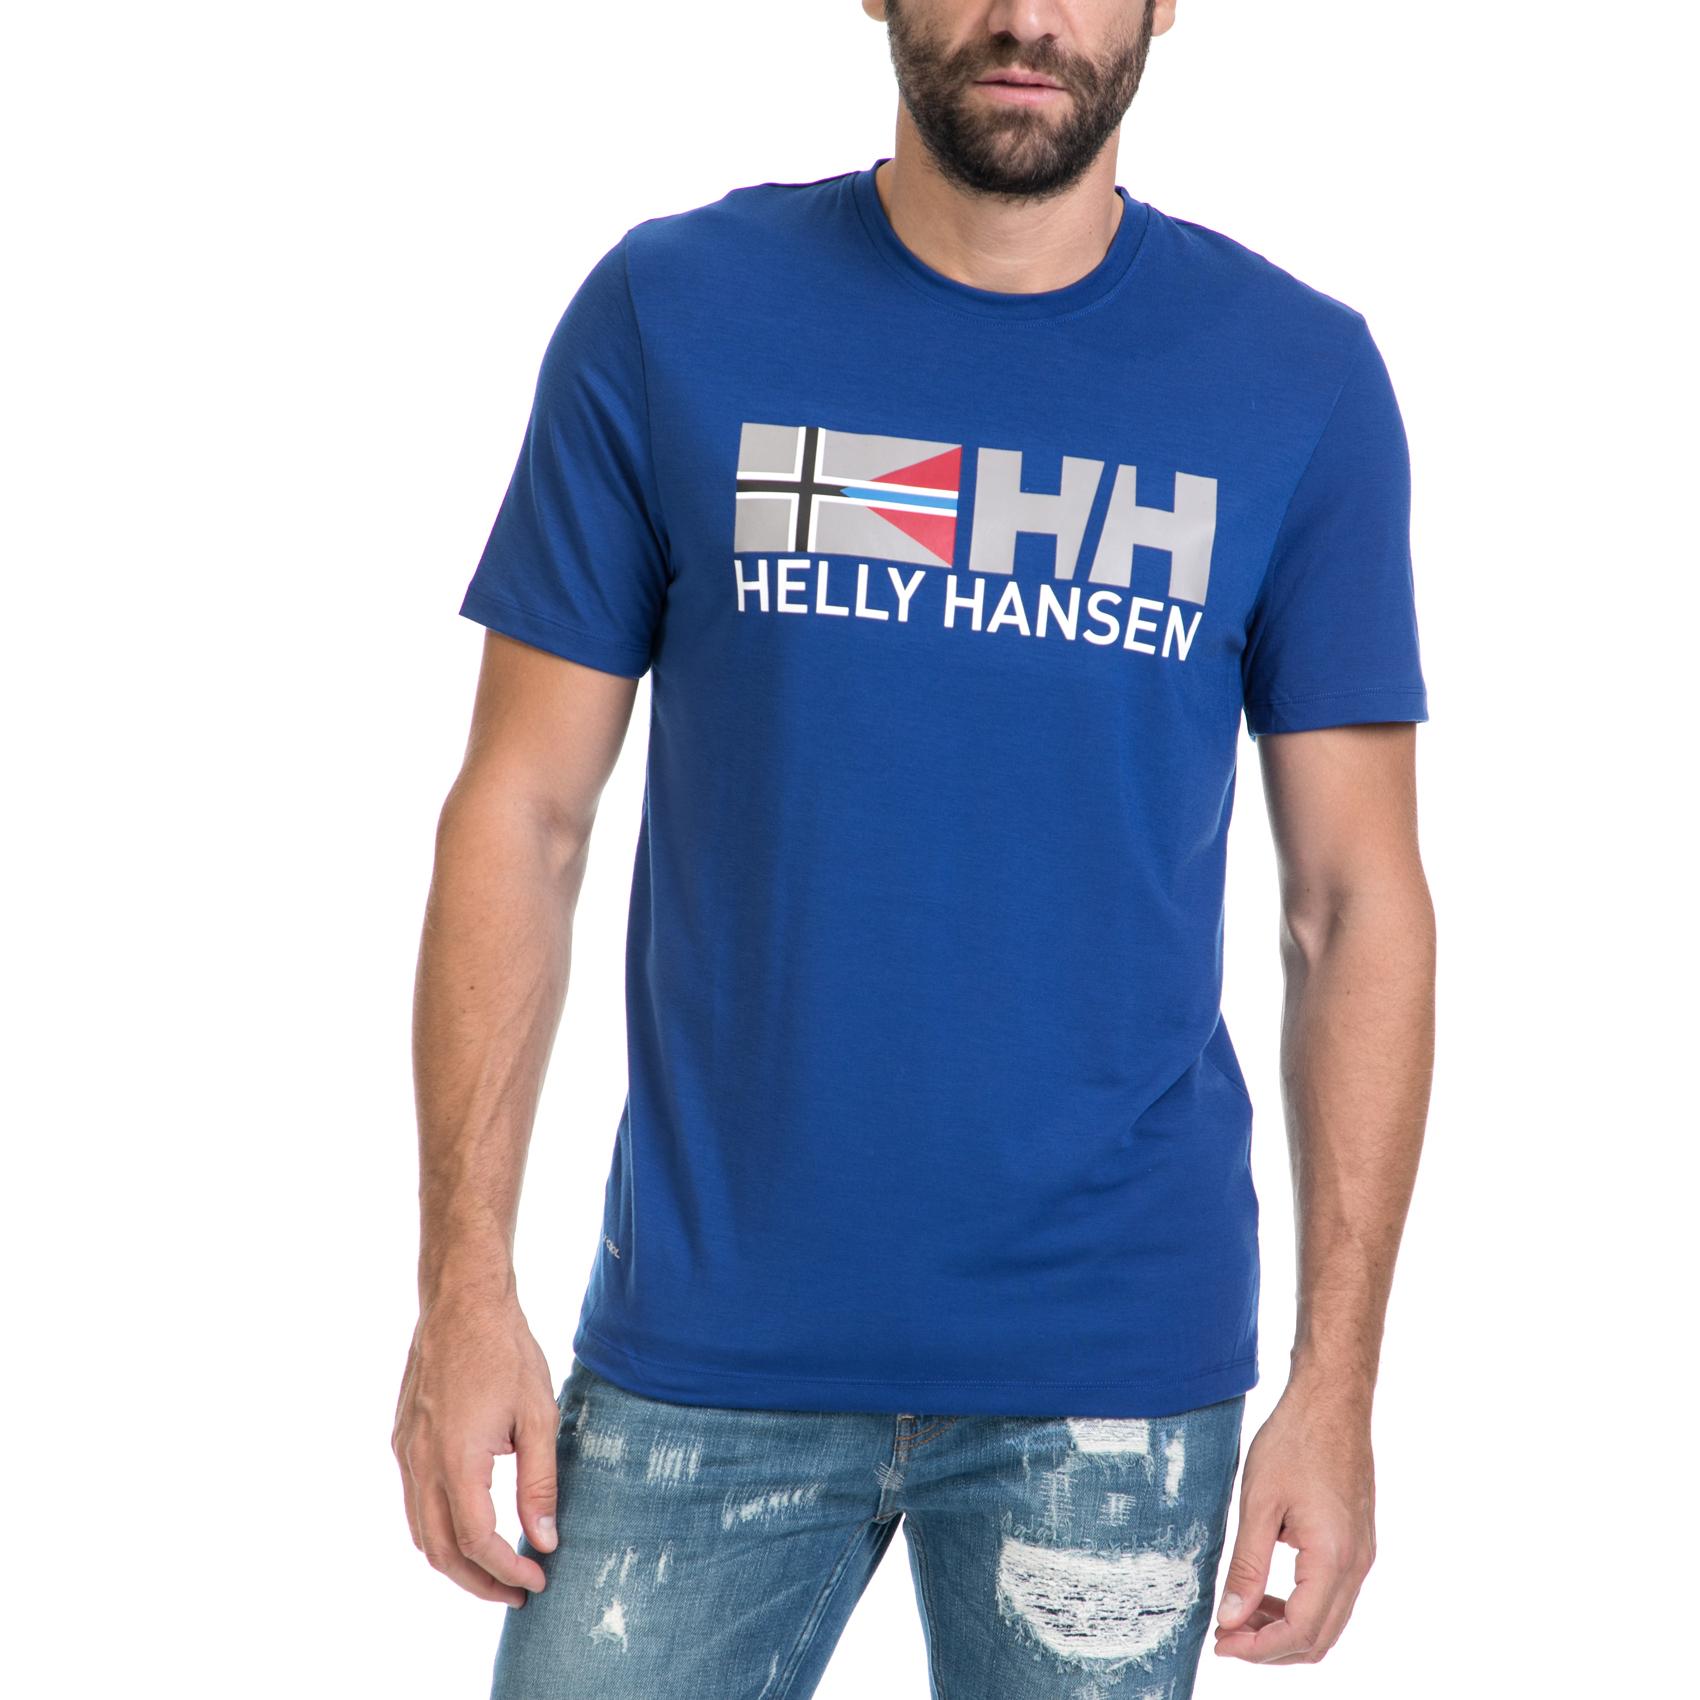 HELLY HANSEN - Ανδρική μπλούζα RUNE μπλε ανδρικά ρούχα αθλητικά t shirt